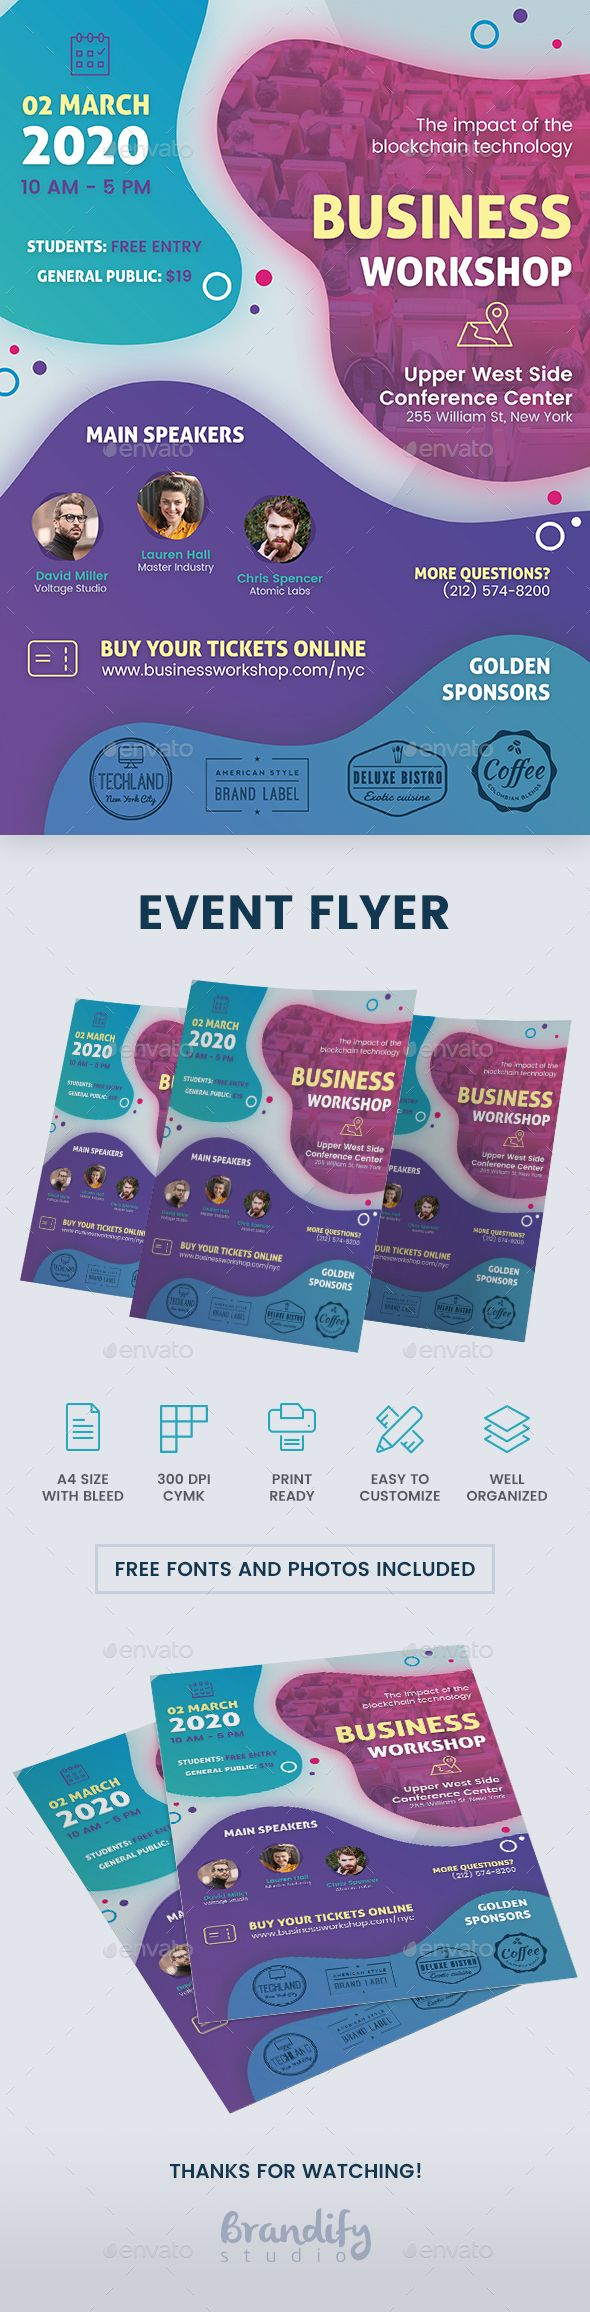 Event Conference Flyer Flyer, Event flyer, Event flyer